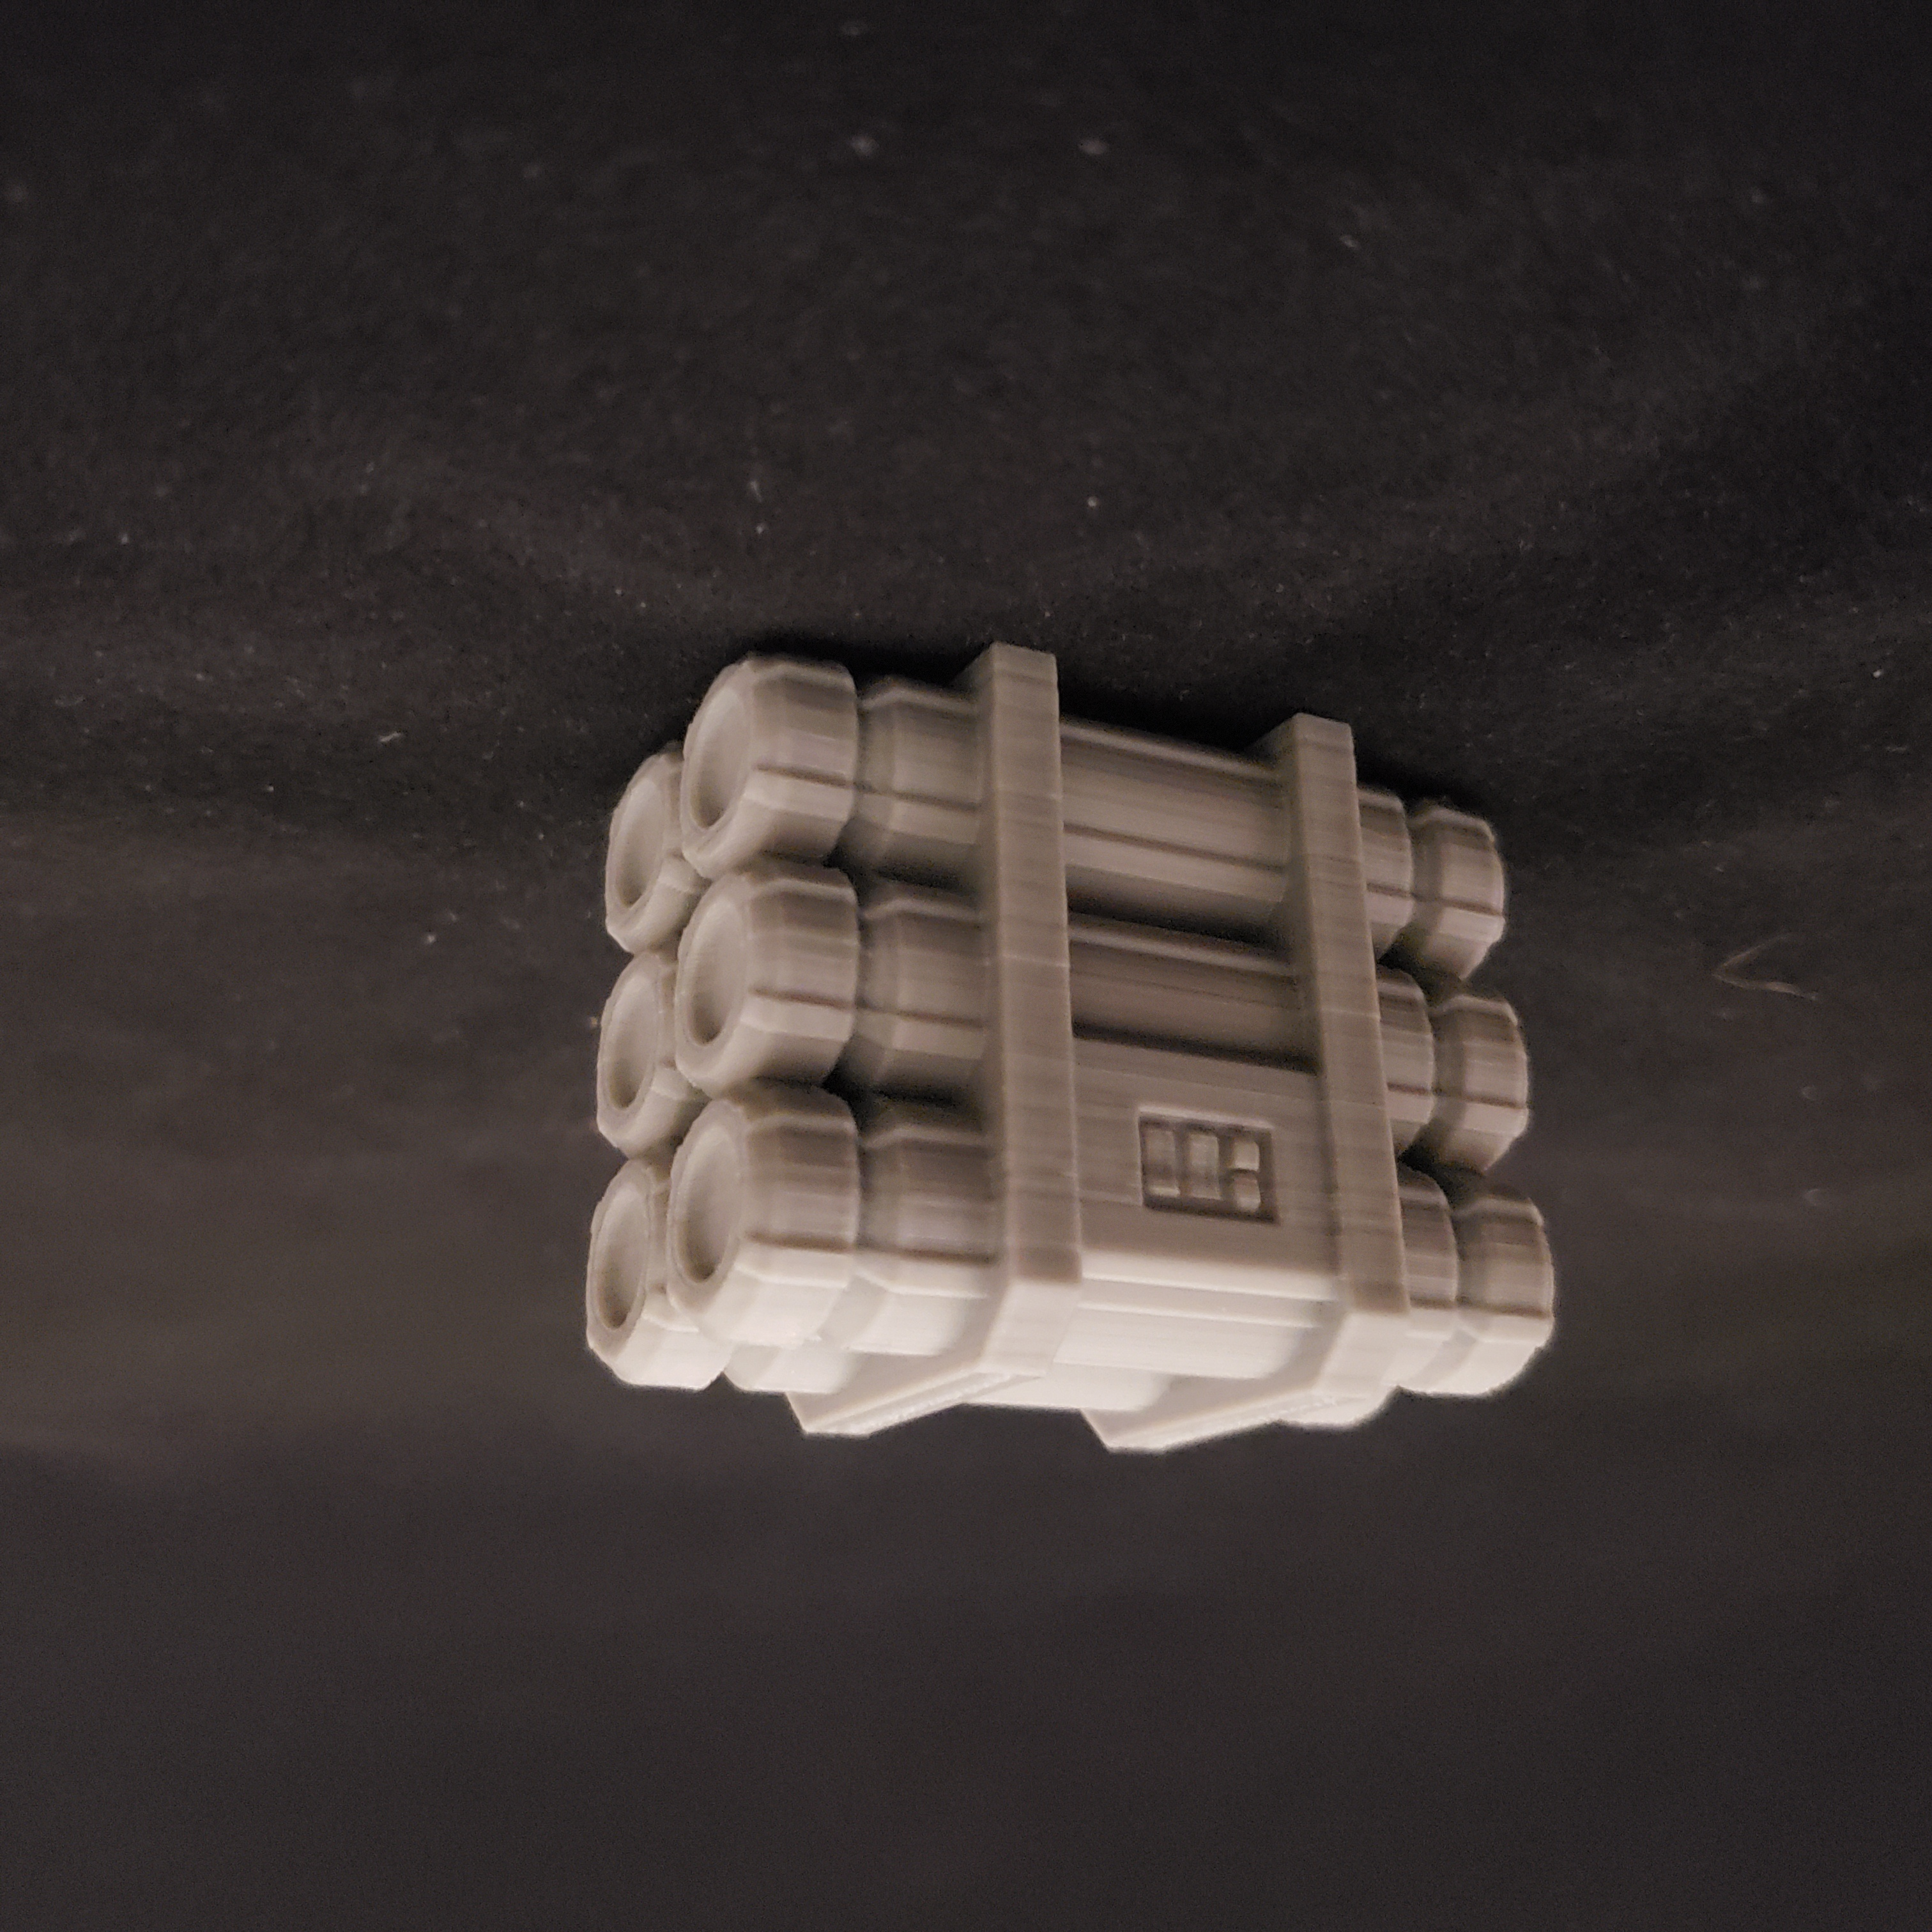 20200911_200926.jpg Download free STL file Sci-Fi Scatter Terrain - Canister Stacks (2 Sizes) • 3D printer design, LoreChest